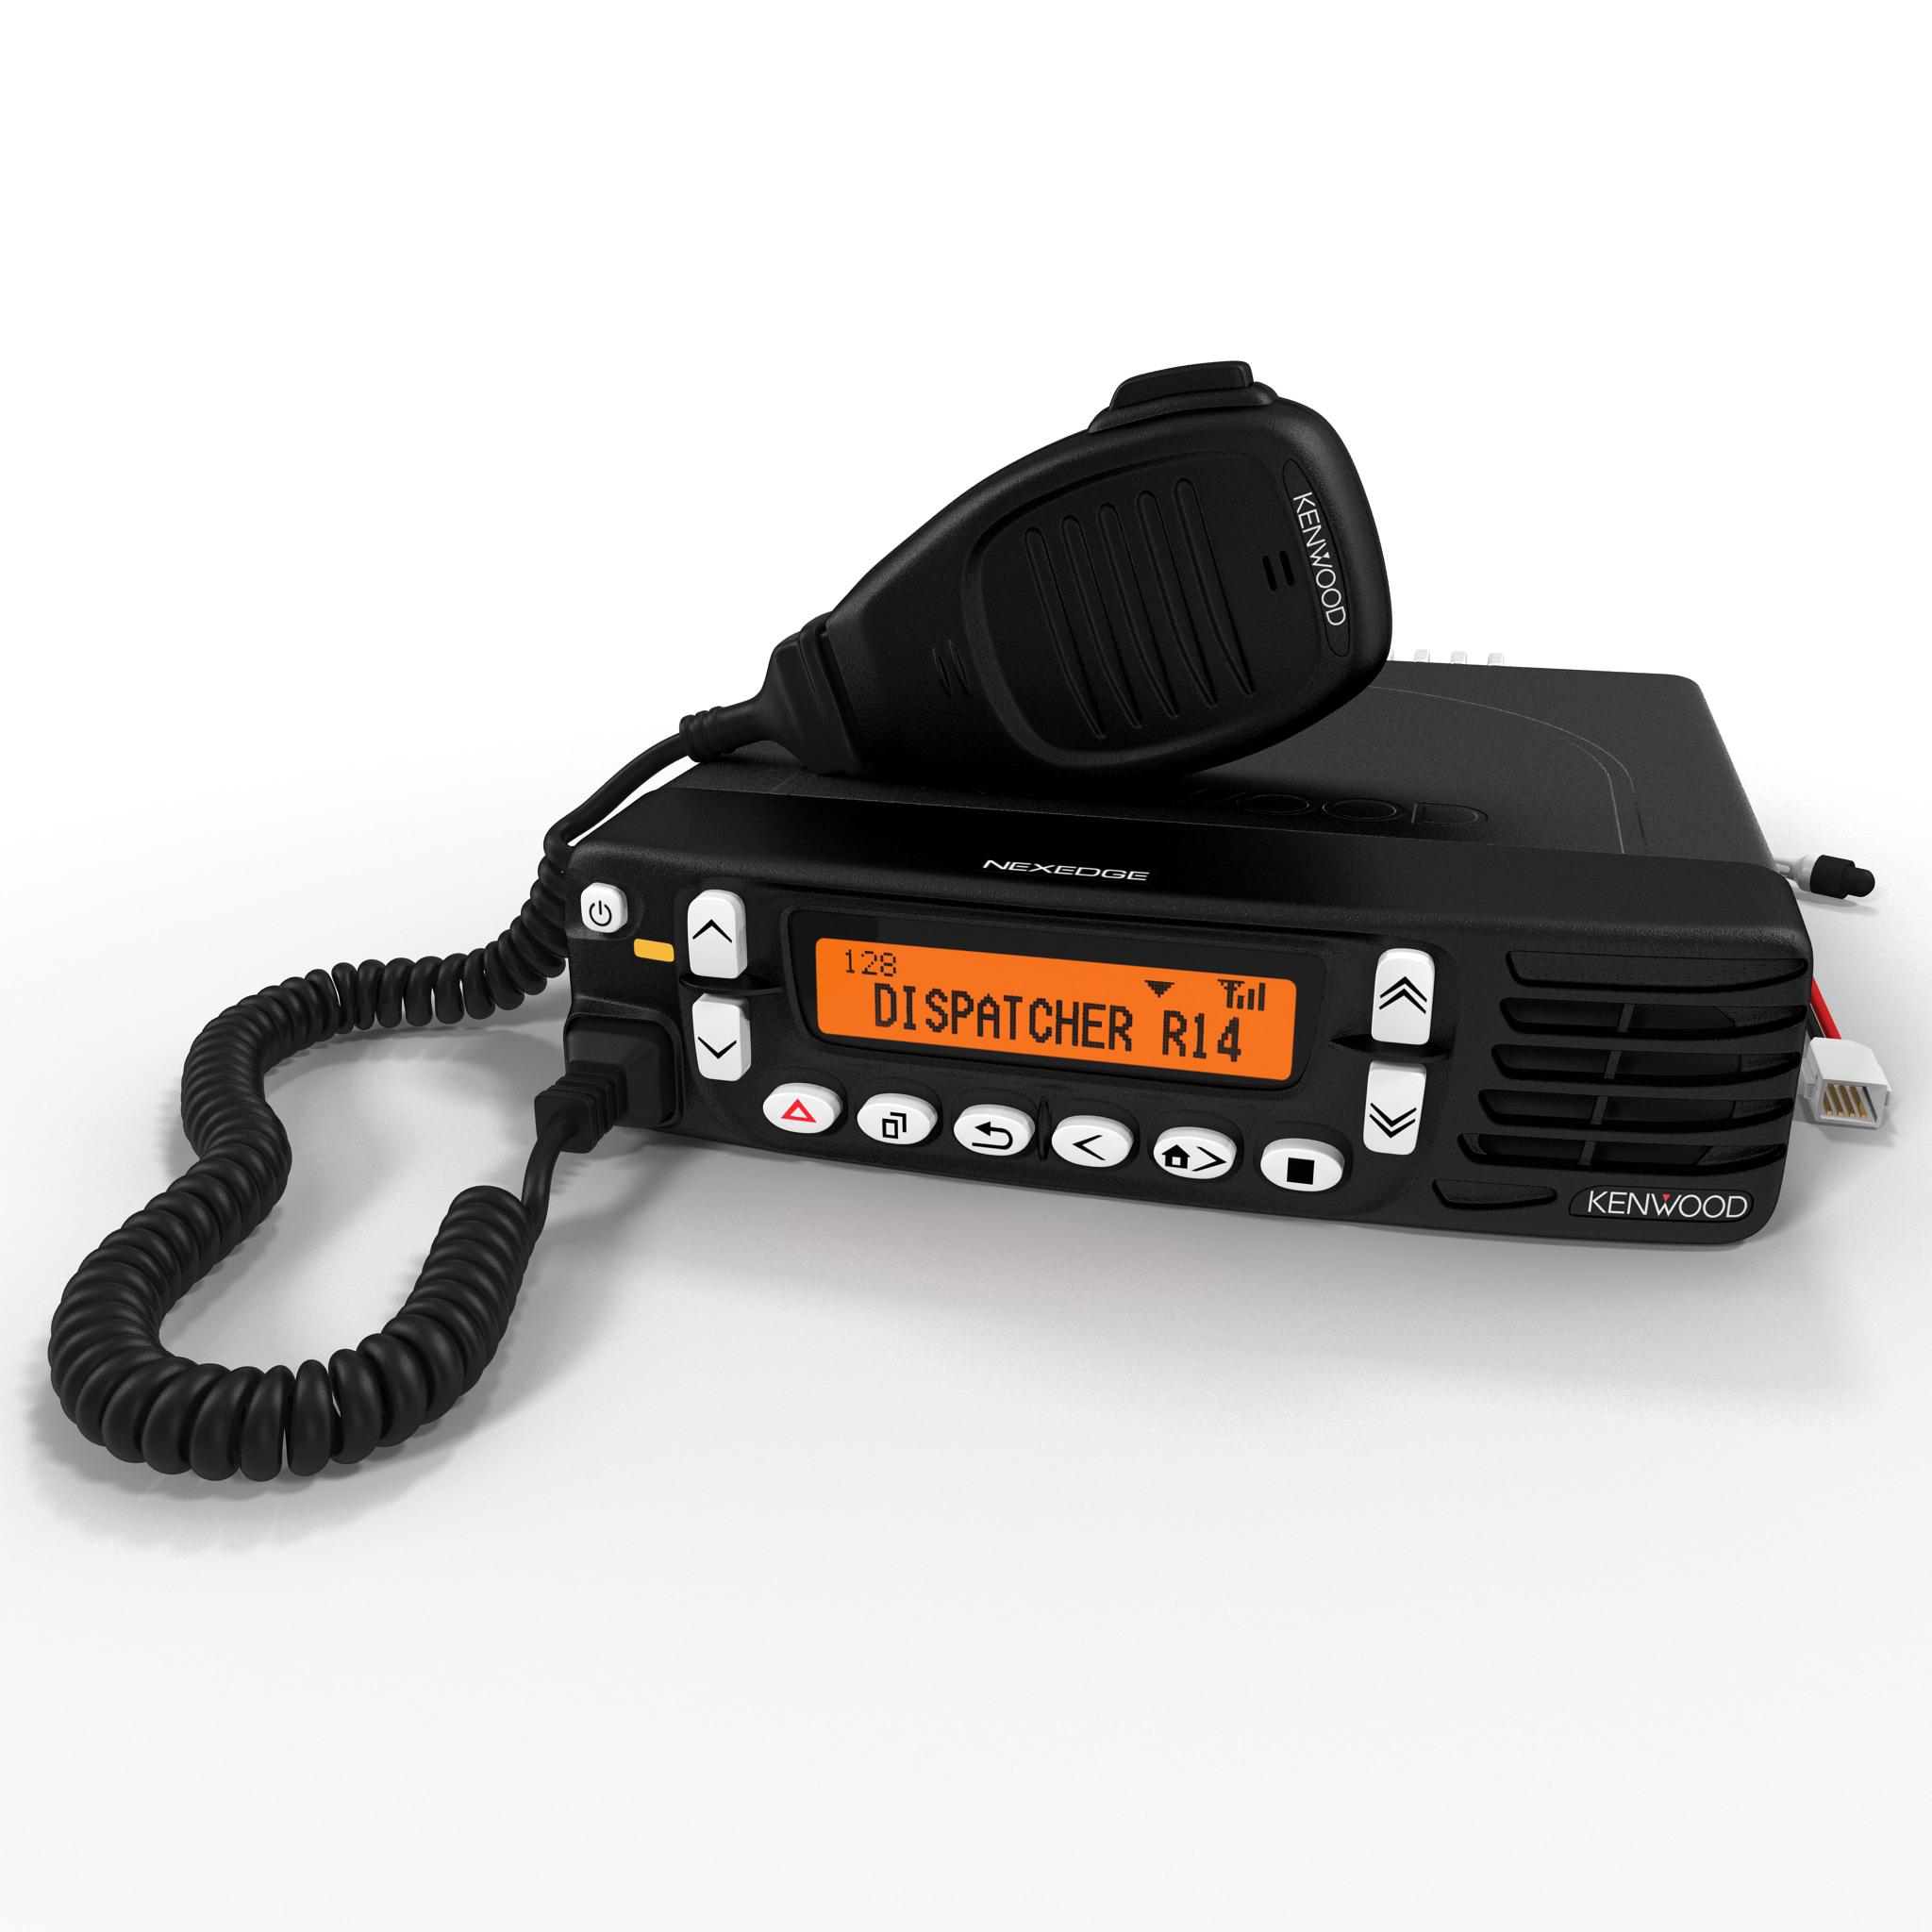 Mobile Radio Kenwood NX-800_2.jpg